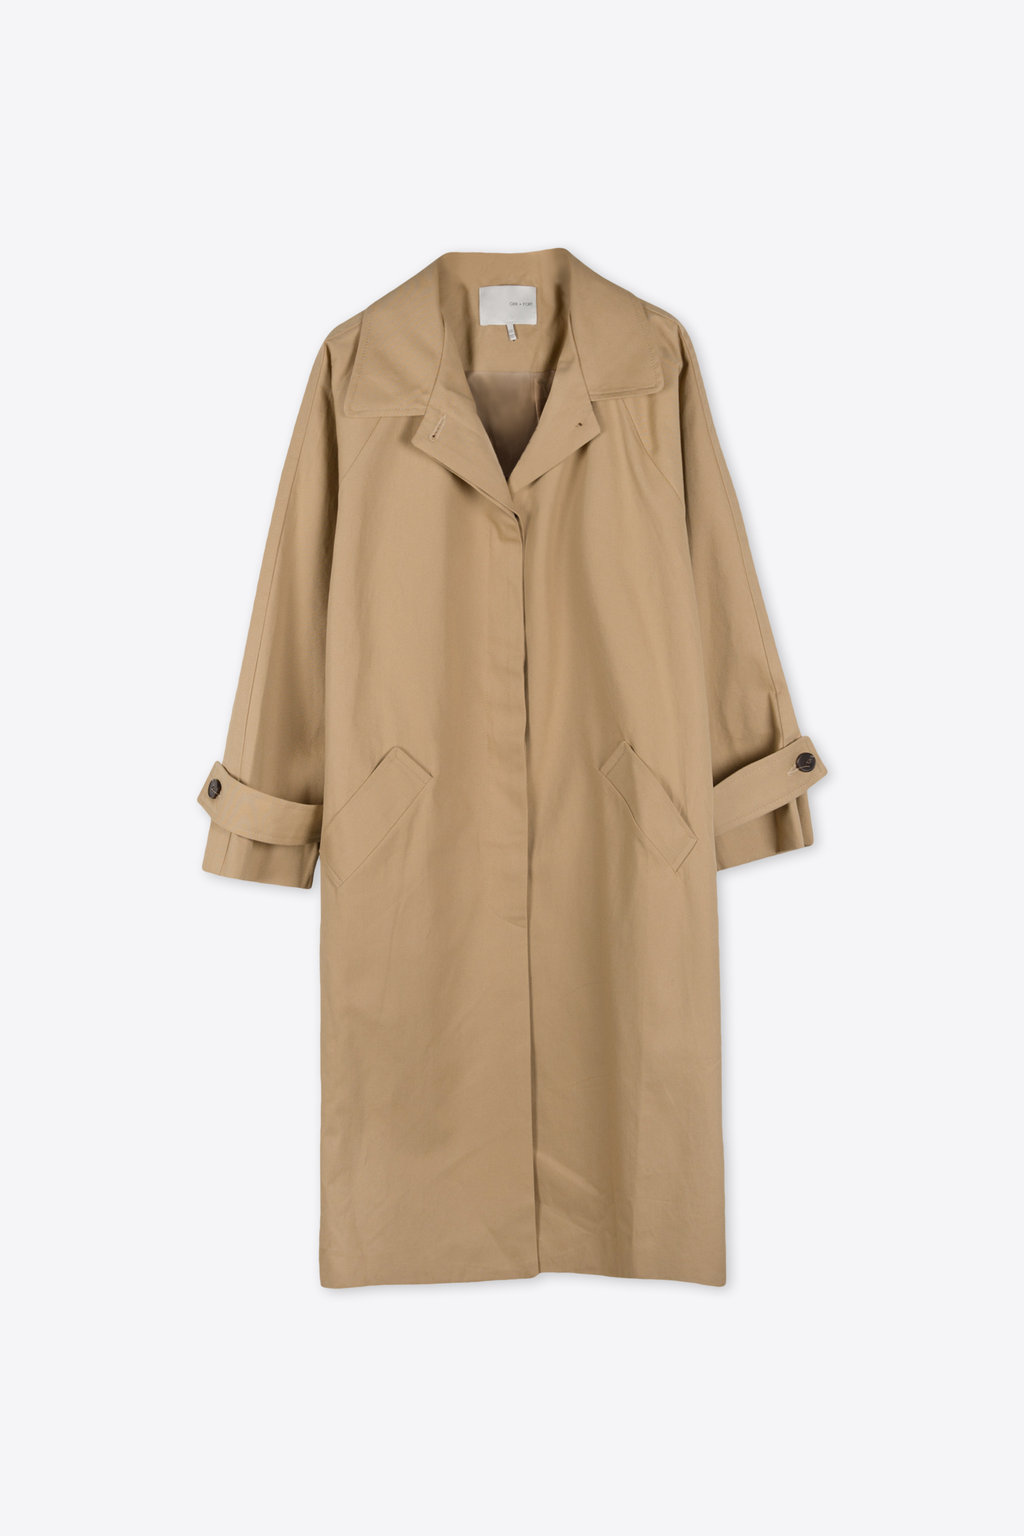 Coat H069 Beige 5